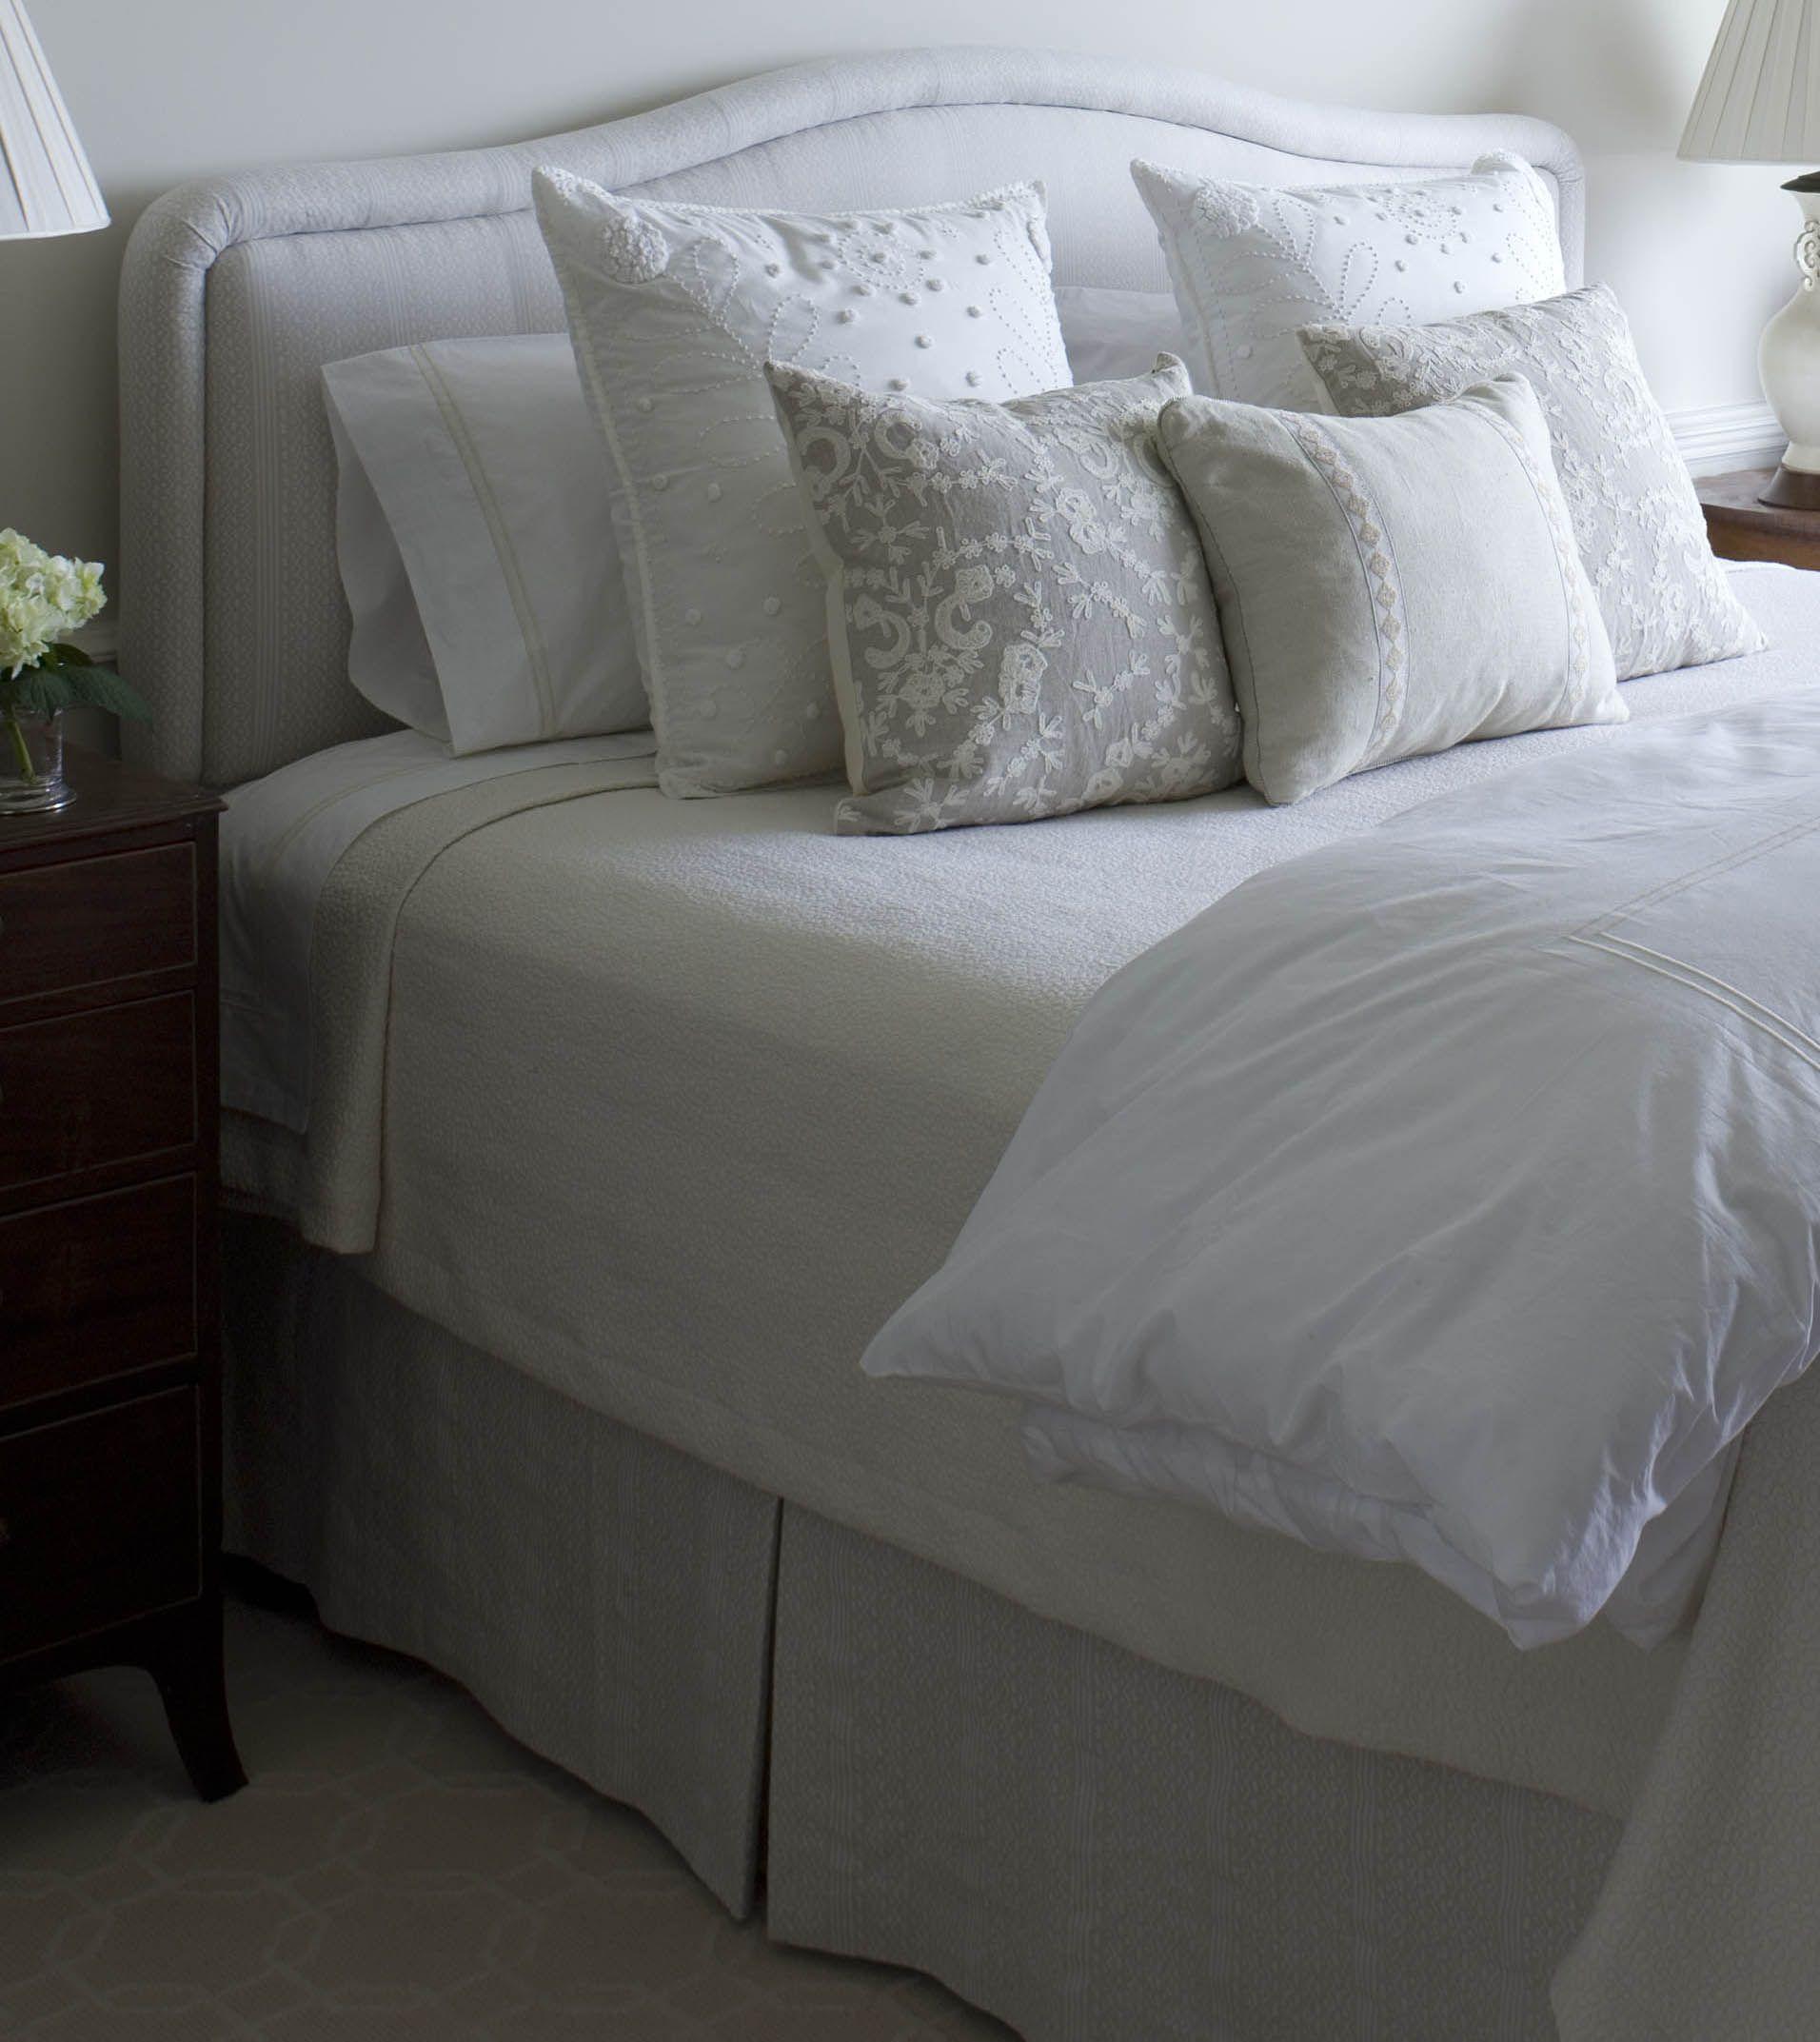 Upholstered Headboards Tips From Phoebe Howard I Prefer Fairly Simple Shapes For Upholstered Bedroom Inspiration Board Bedroom Headboard Upholstered Headboard